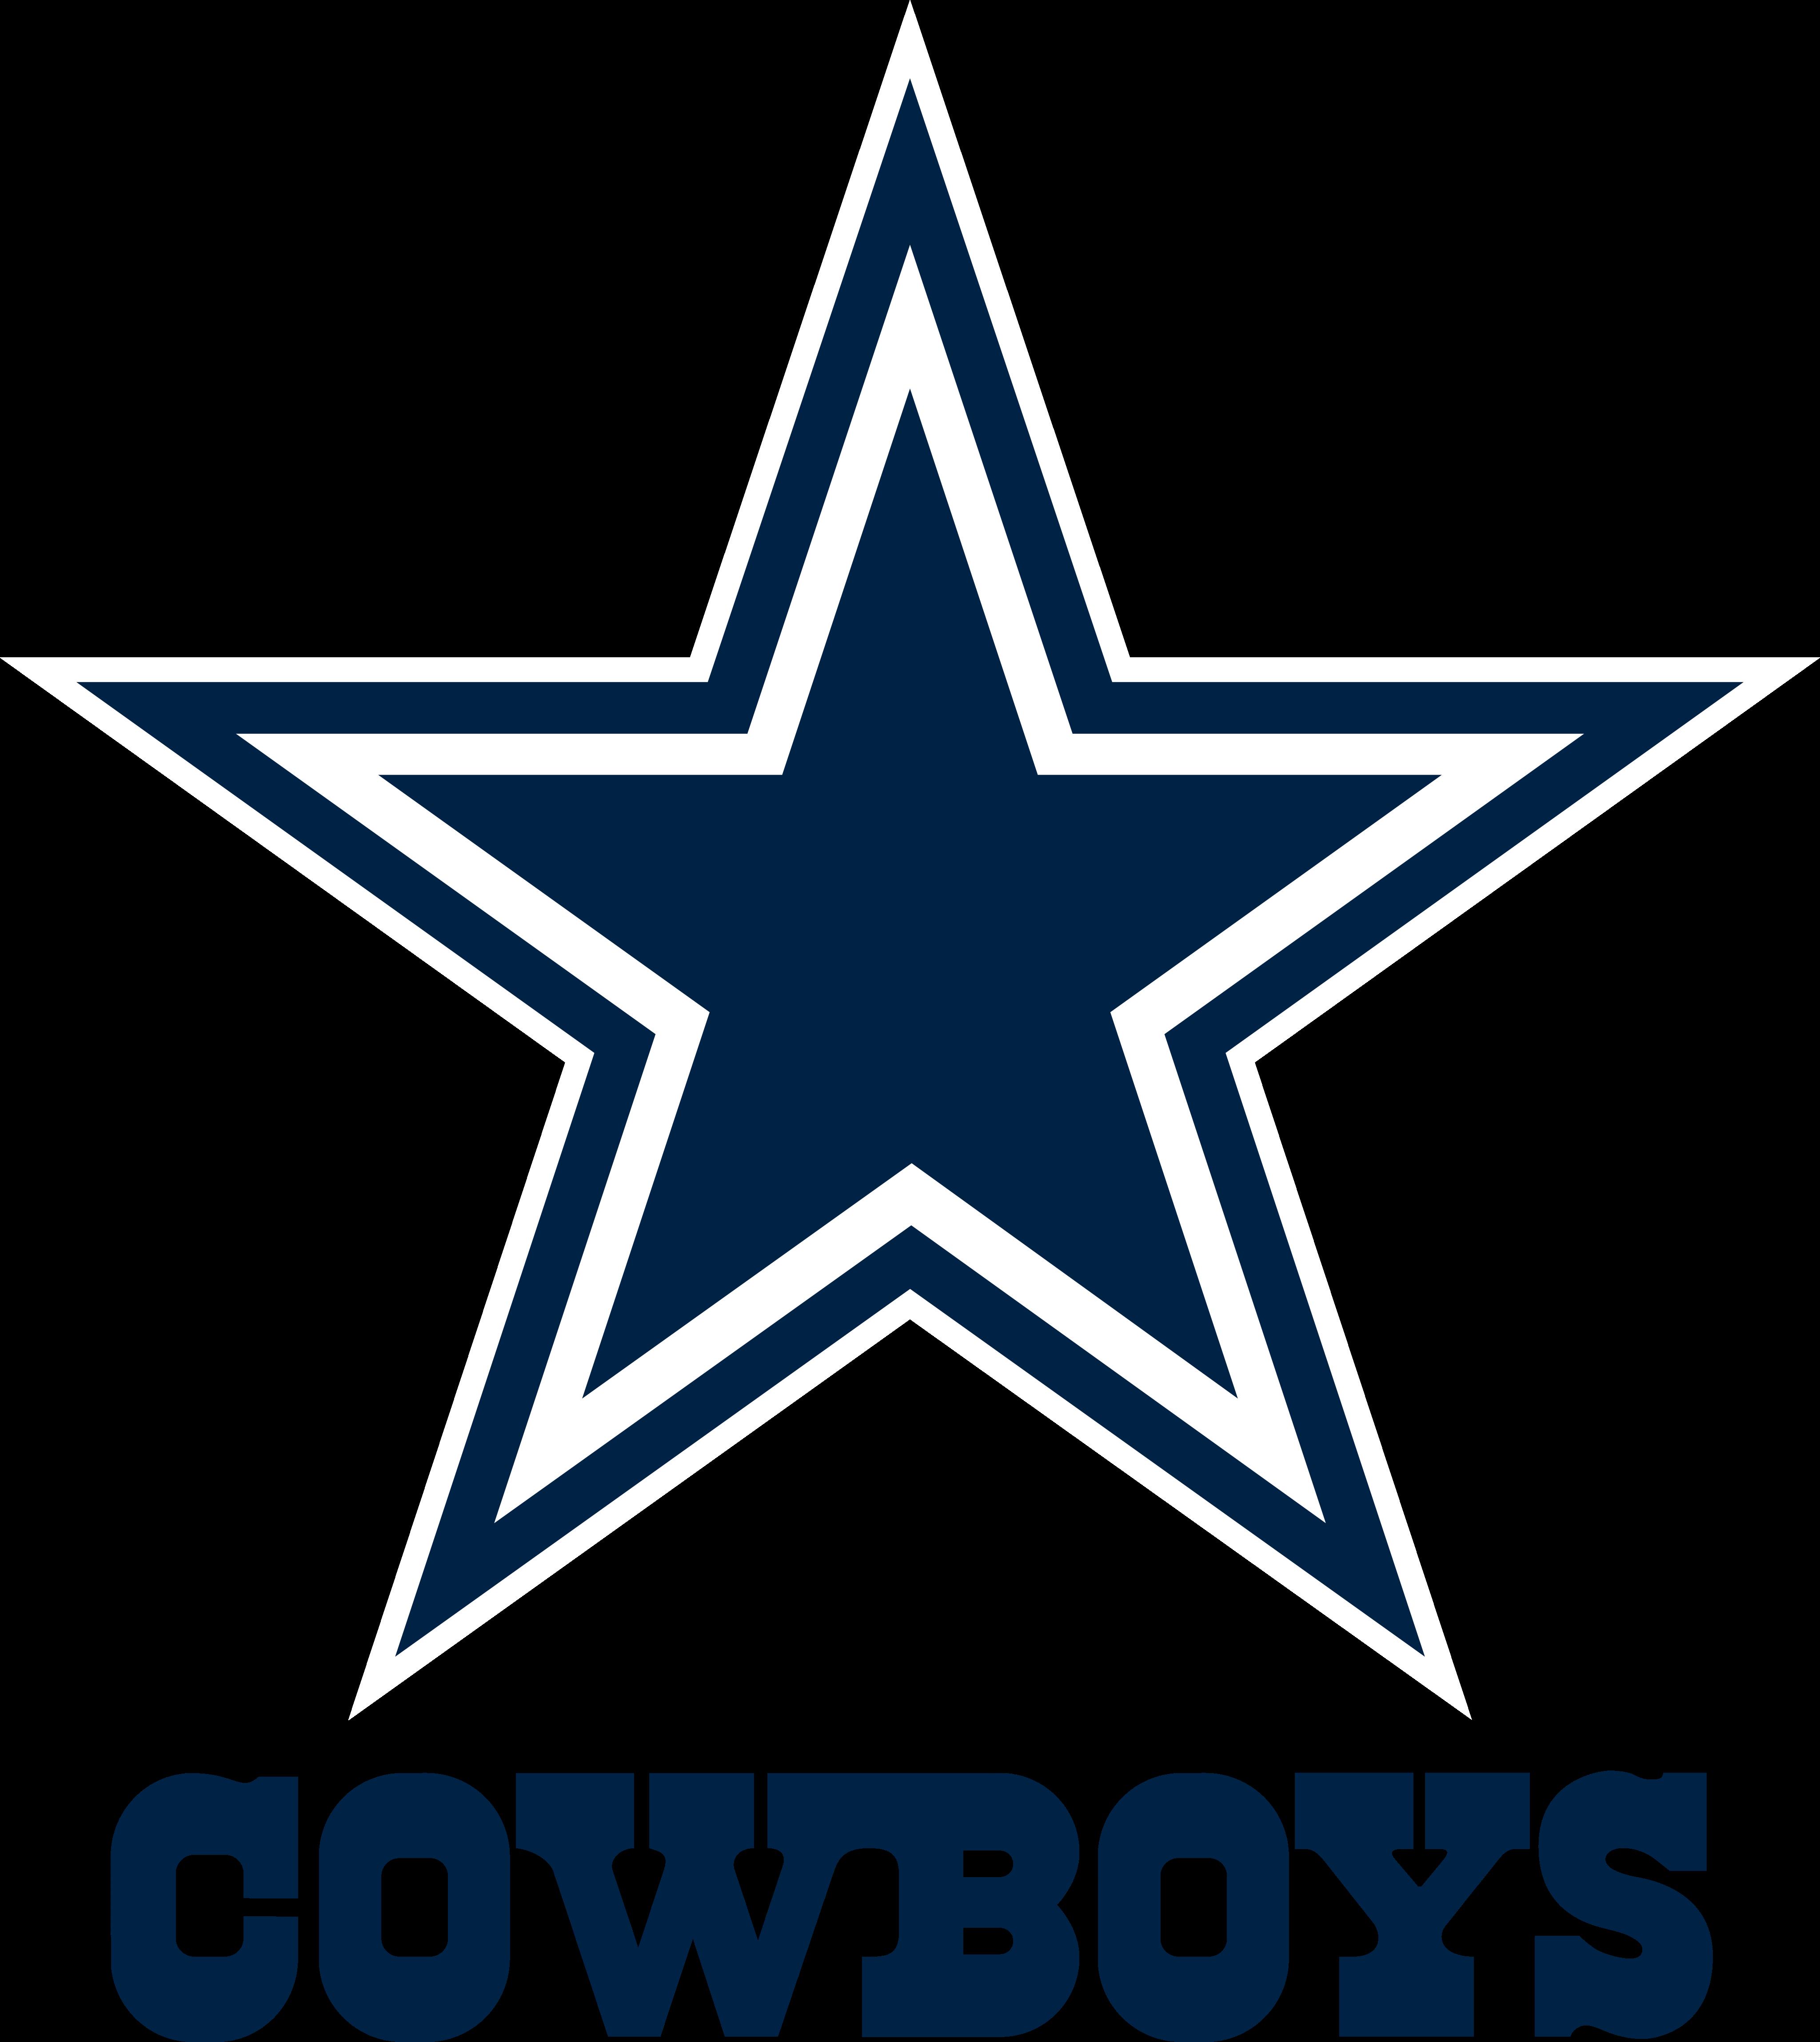 dallas cowboys logo - png e vetor - download de logo  logo download